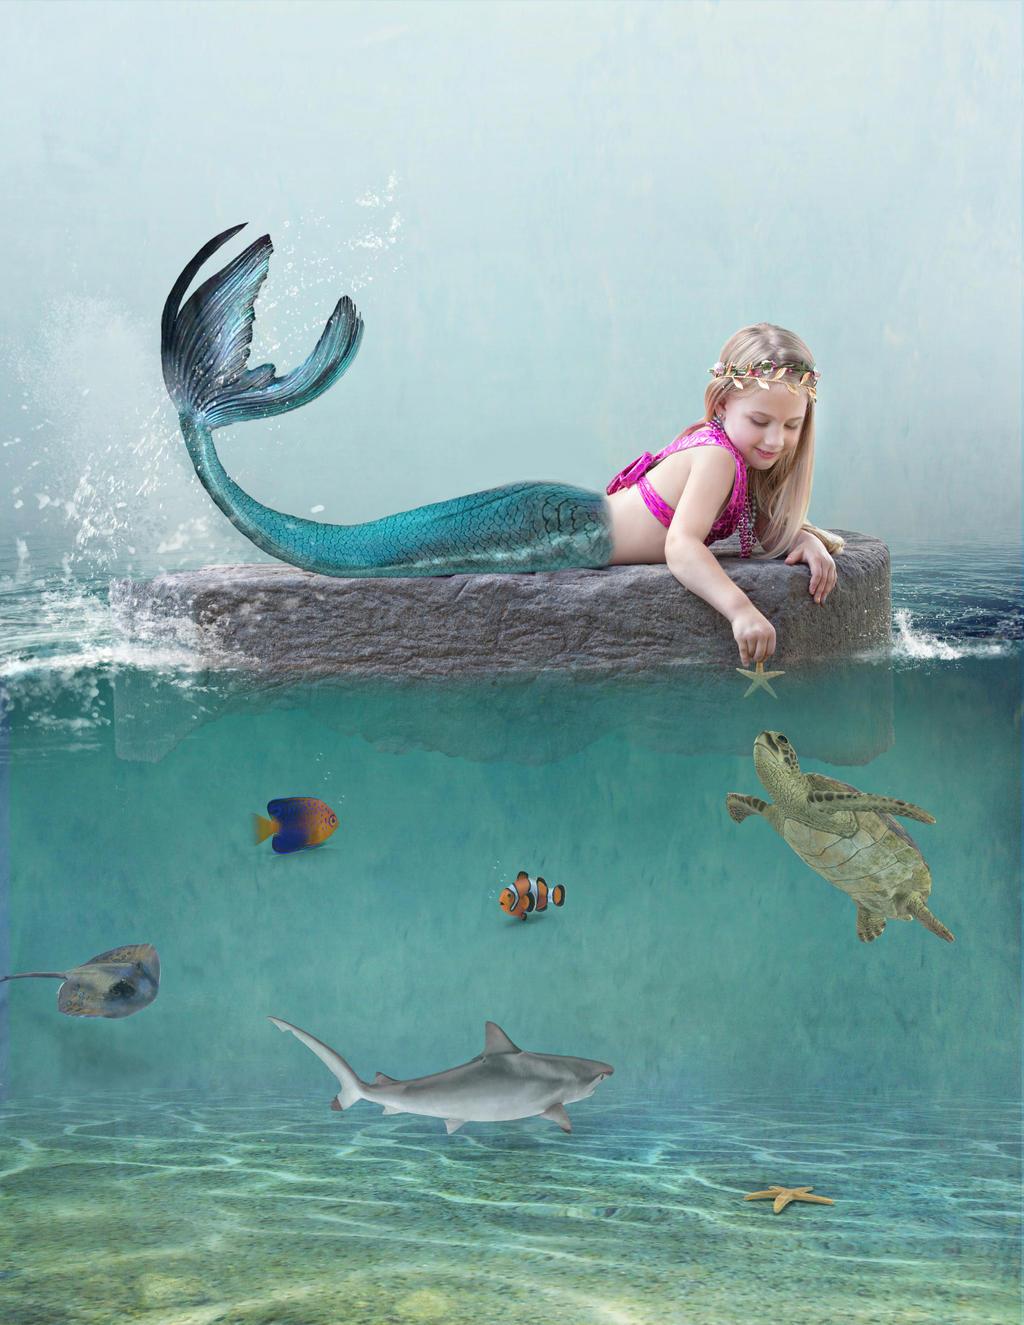 Lylah Mermaid1 by jna2001